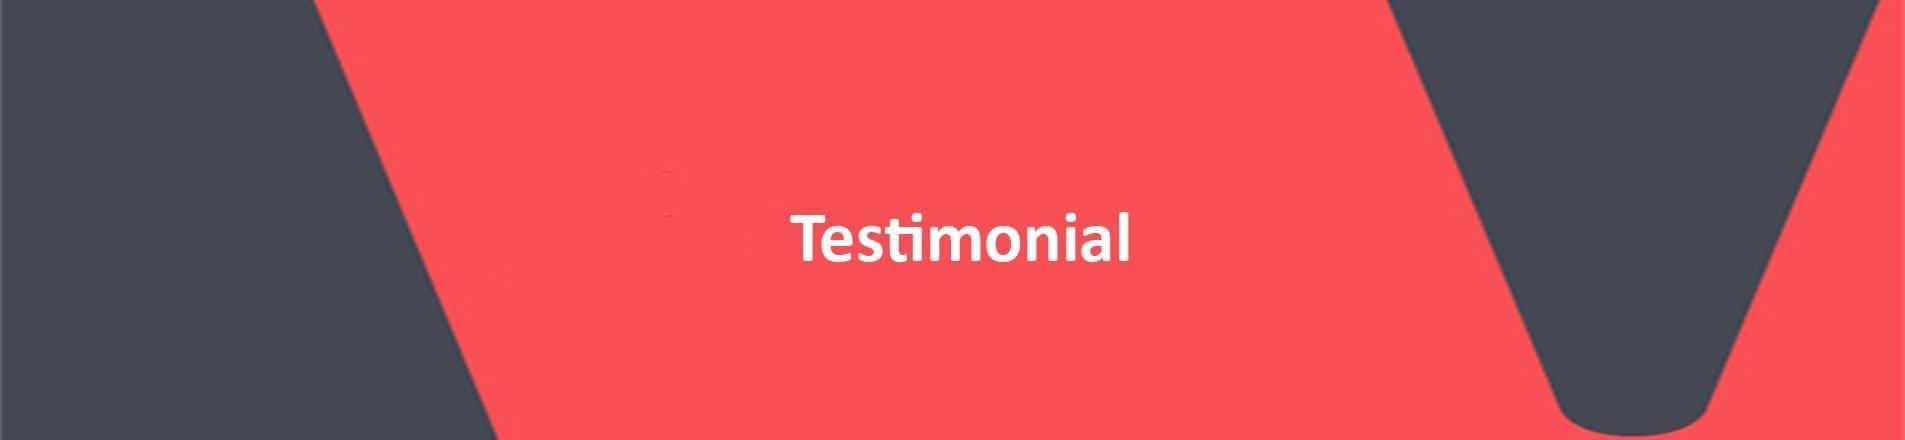 The word Testimonial on red VERCIDA background